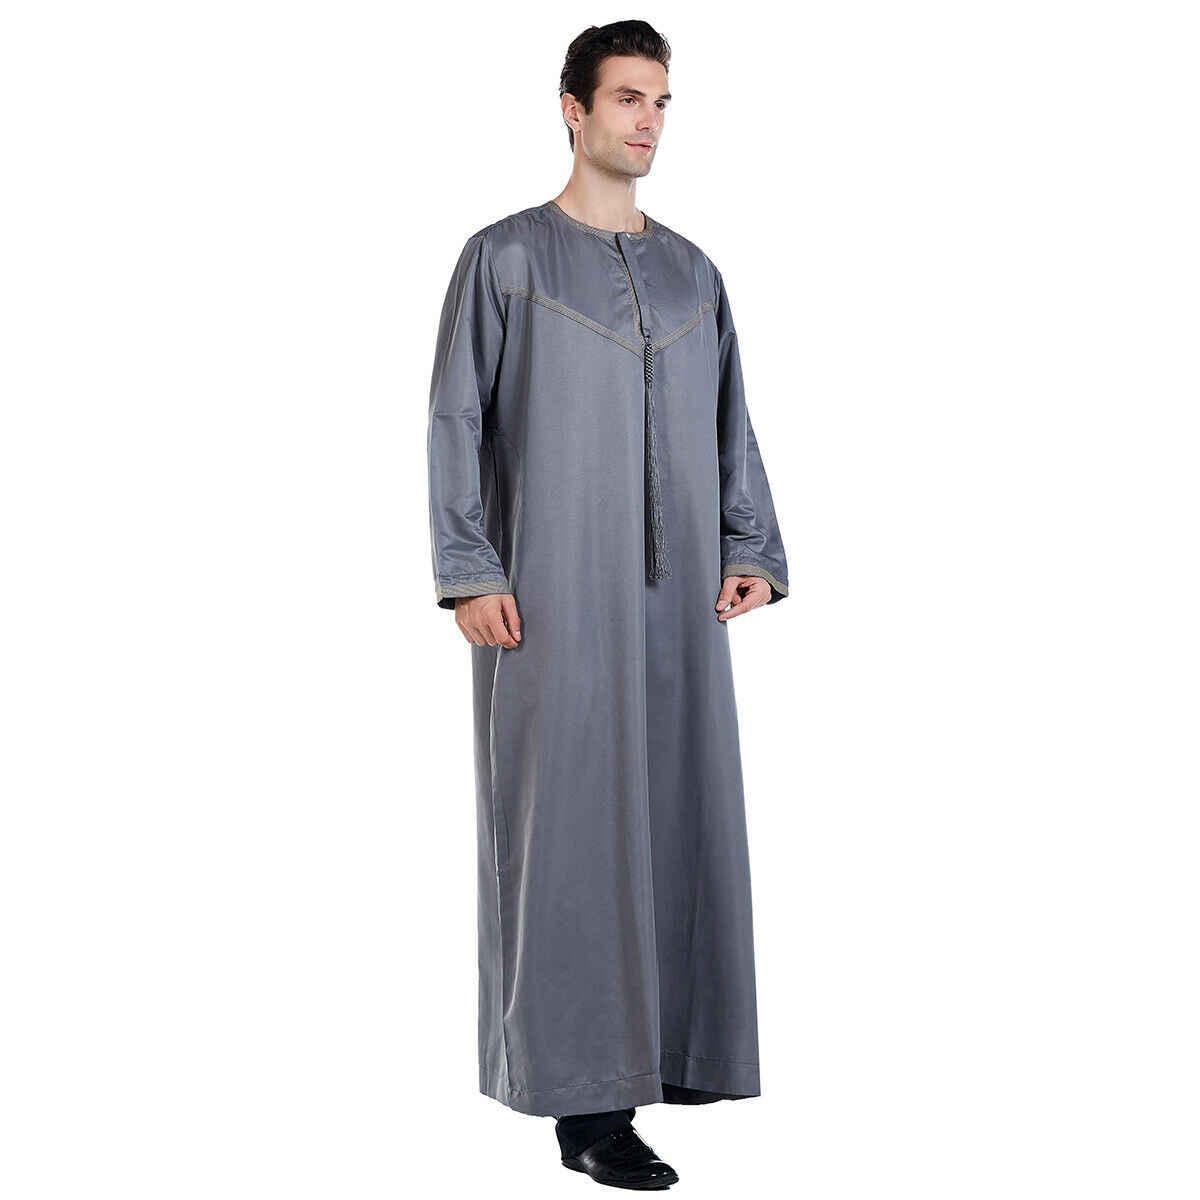 Mens Long Sleeve Muslim Cloting Irregular Saudi Abaya Kurta Shirts Kaftan Thobe